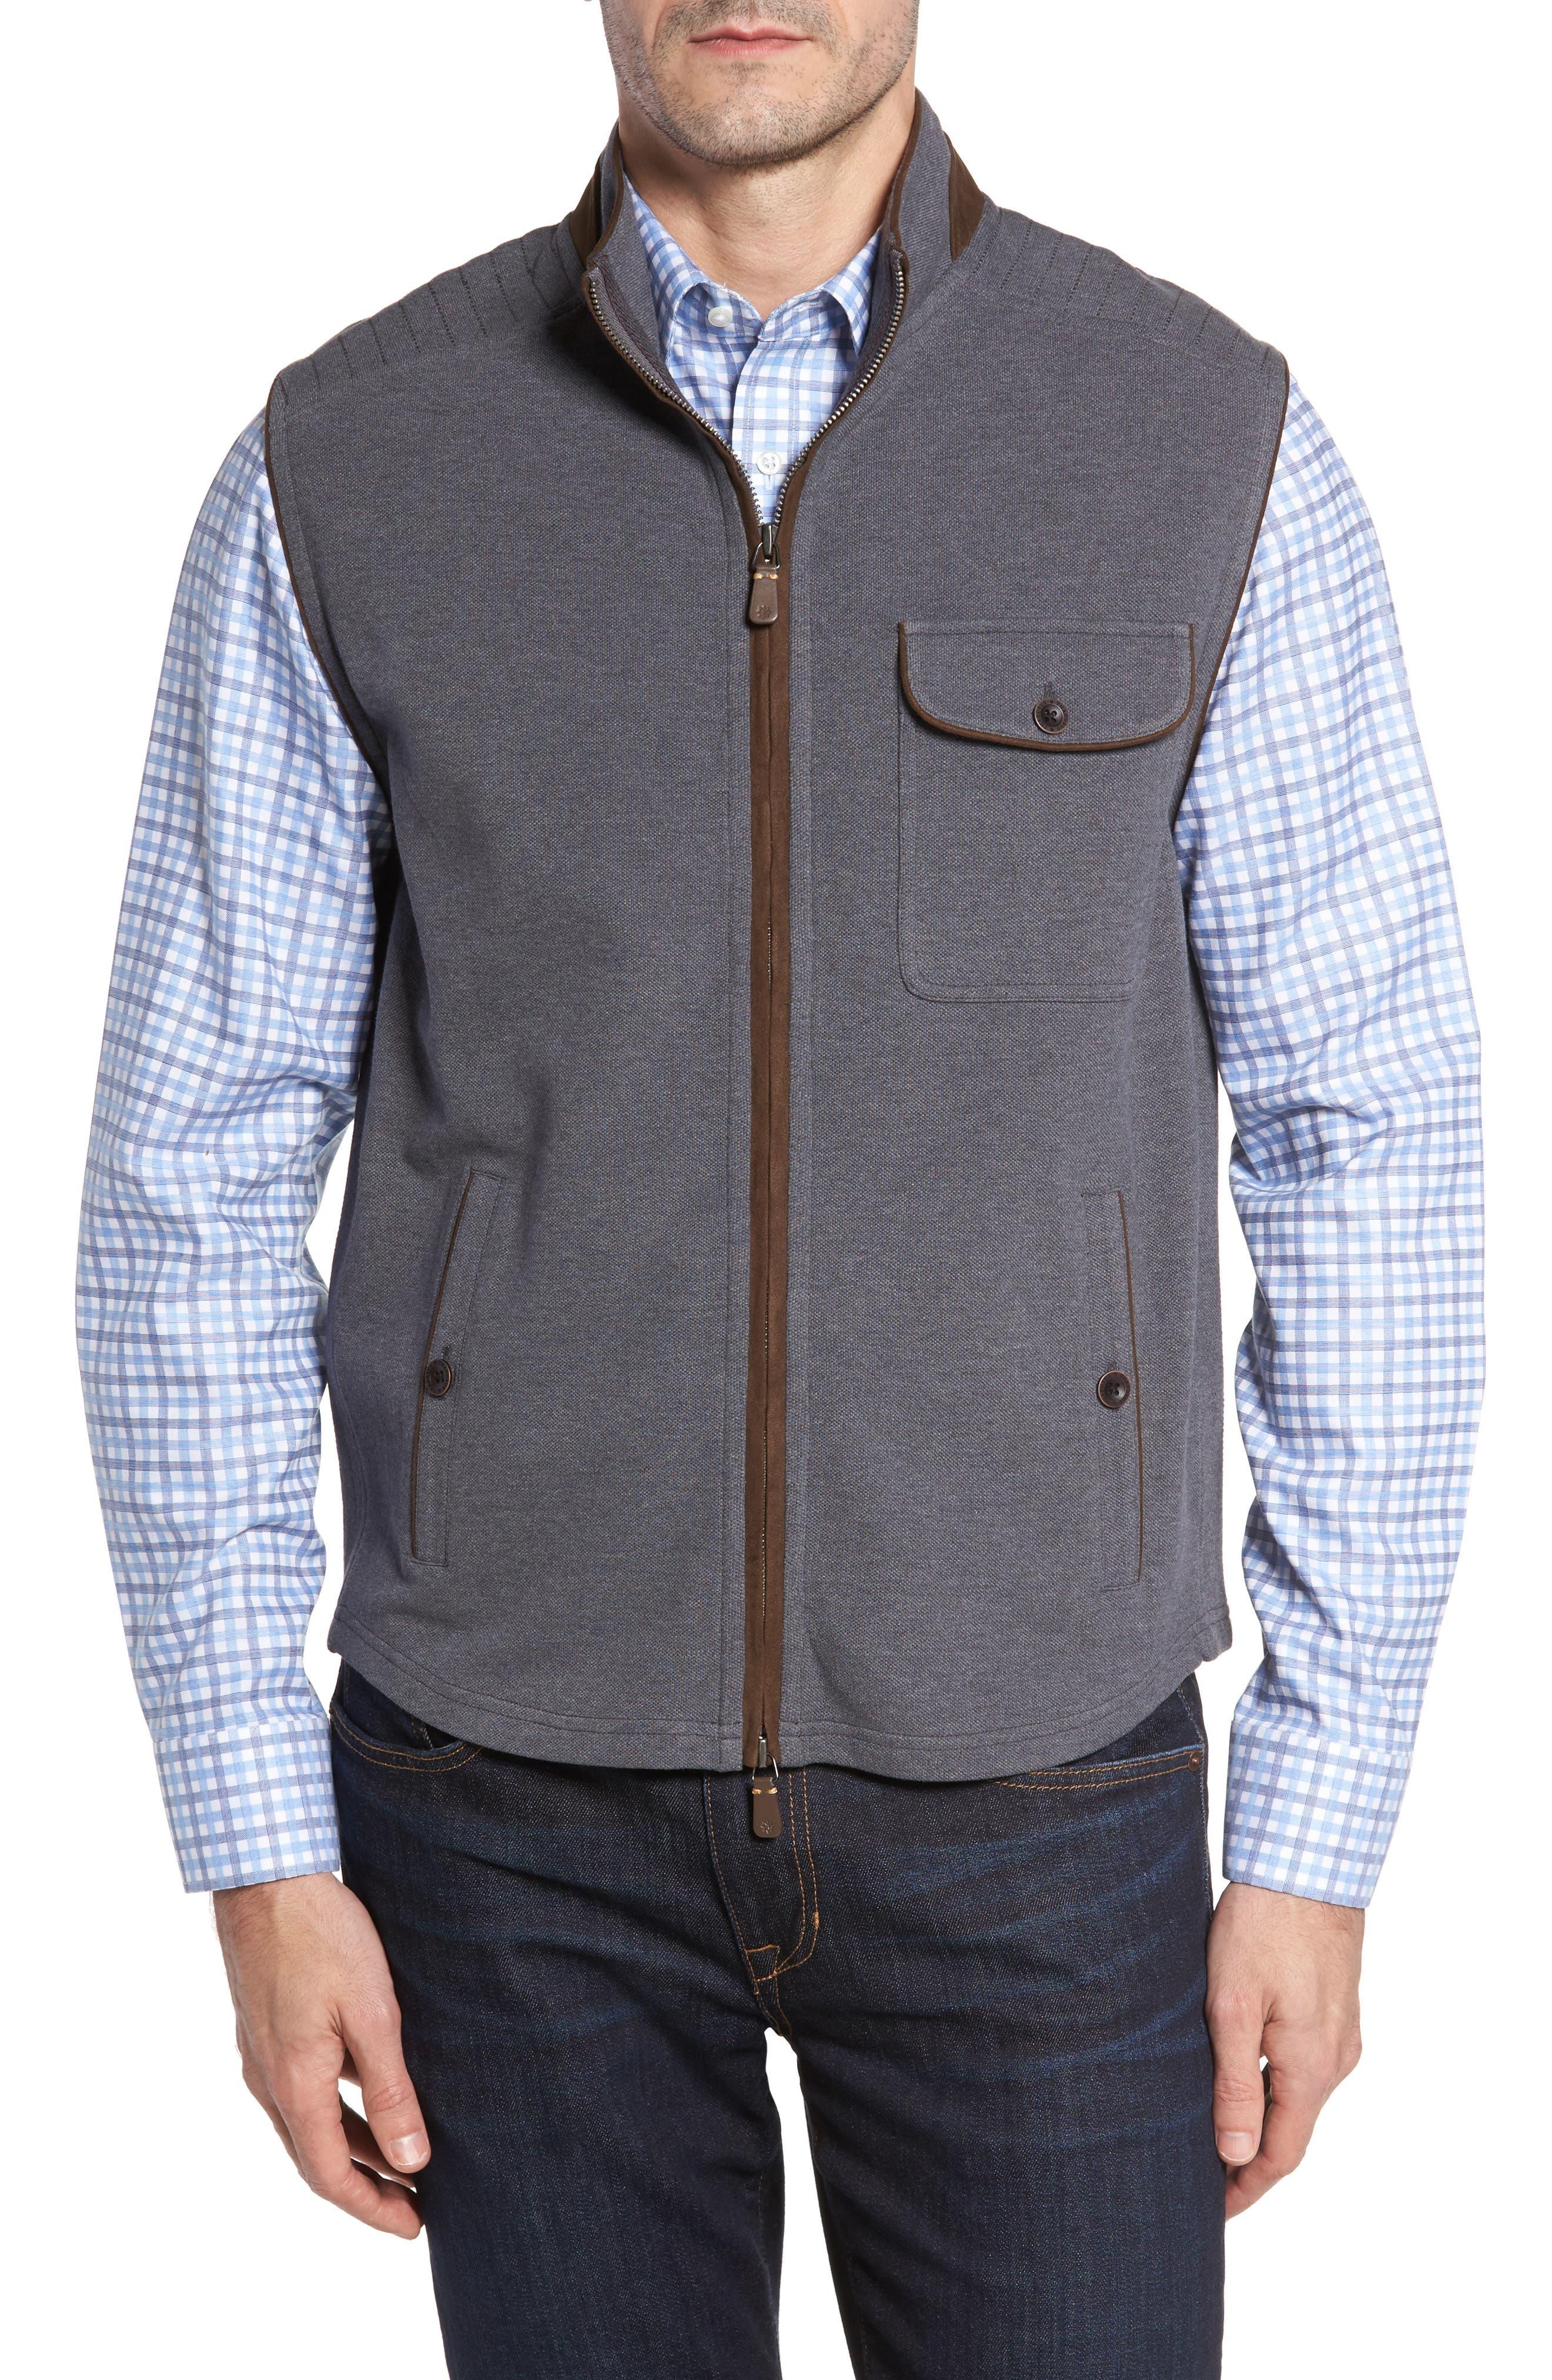 THADDEUS Robert Full Zip Vest, Main, color, 014